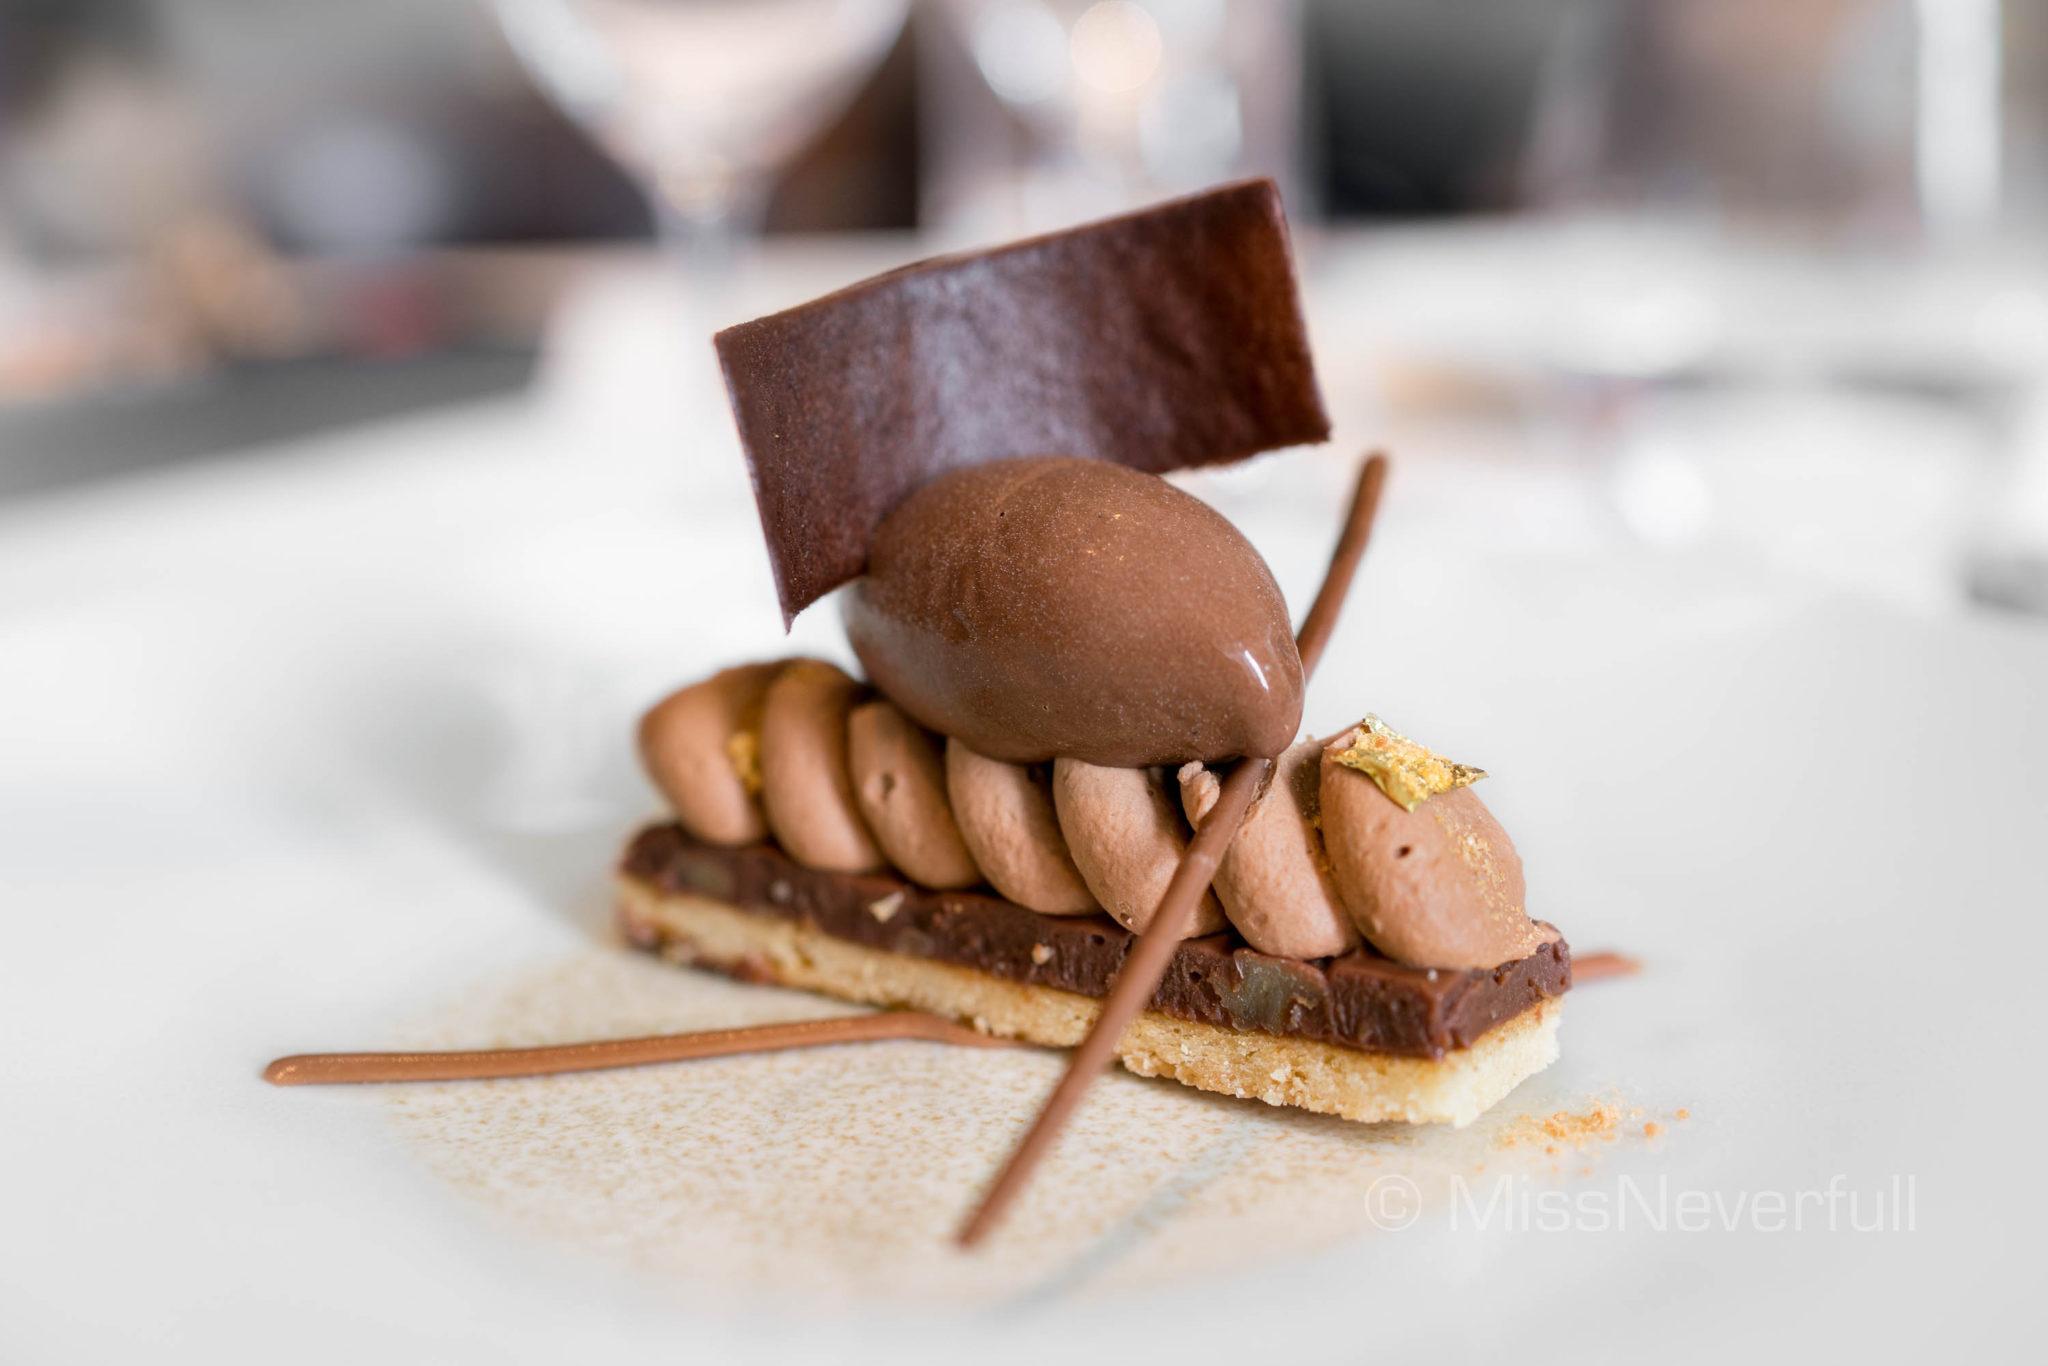 Chocolate walnut tart (HK$160)